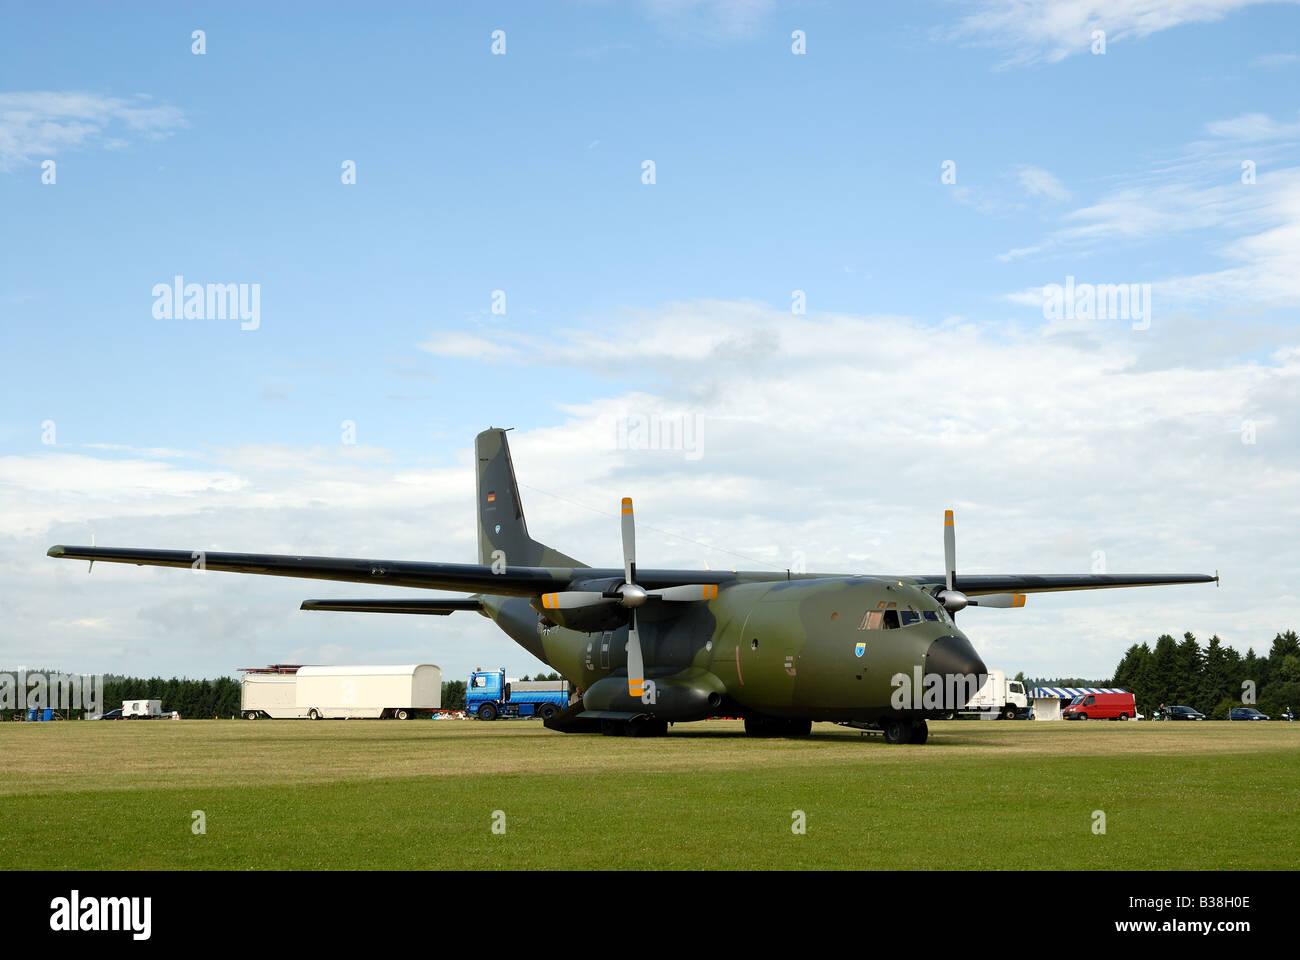 German military transport aircraft Transall C-160 - Stock Image